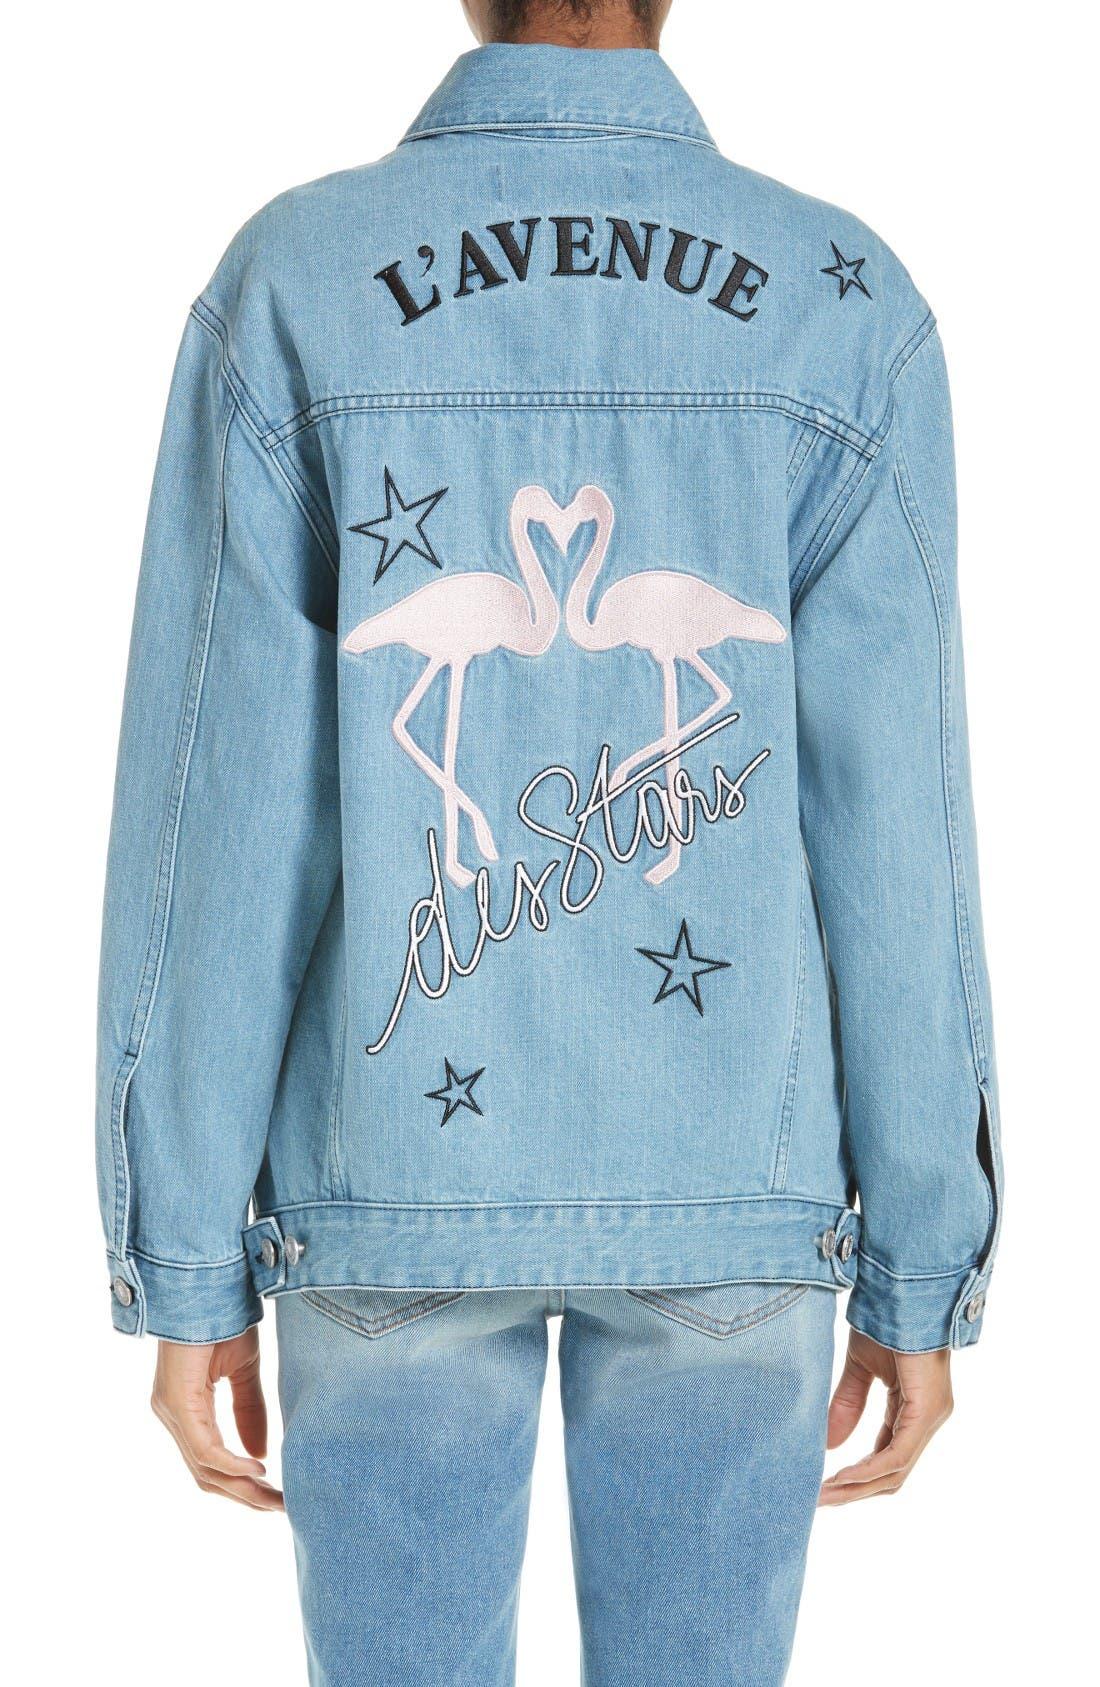 Alternate Image 2  - être cécile L'Avenue des Stars Embroidered Denim Jacket